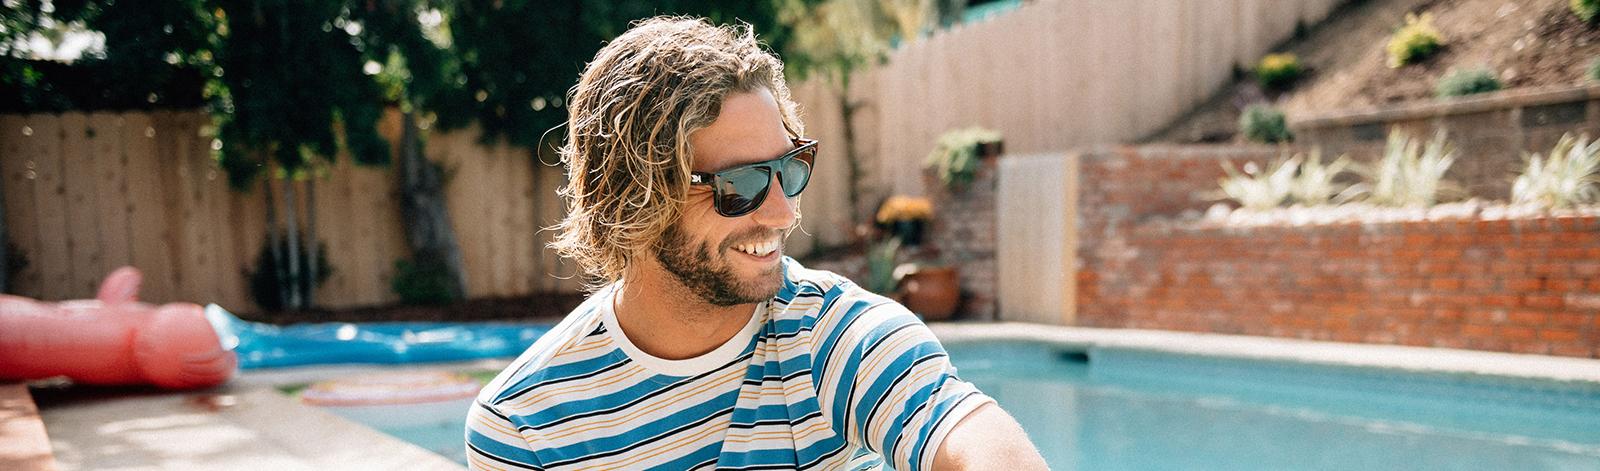 Man wearing Knockaround Torrey Pines sunglasses by the pool